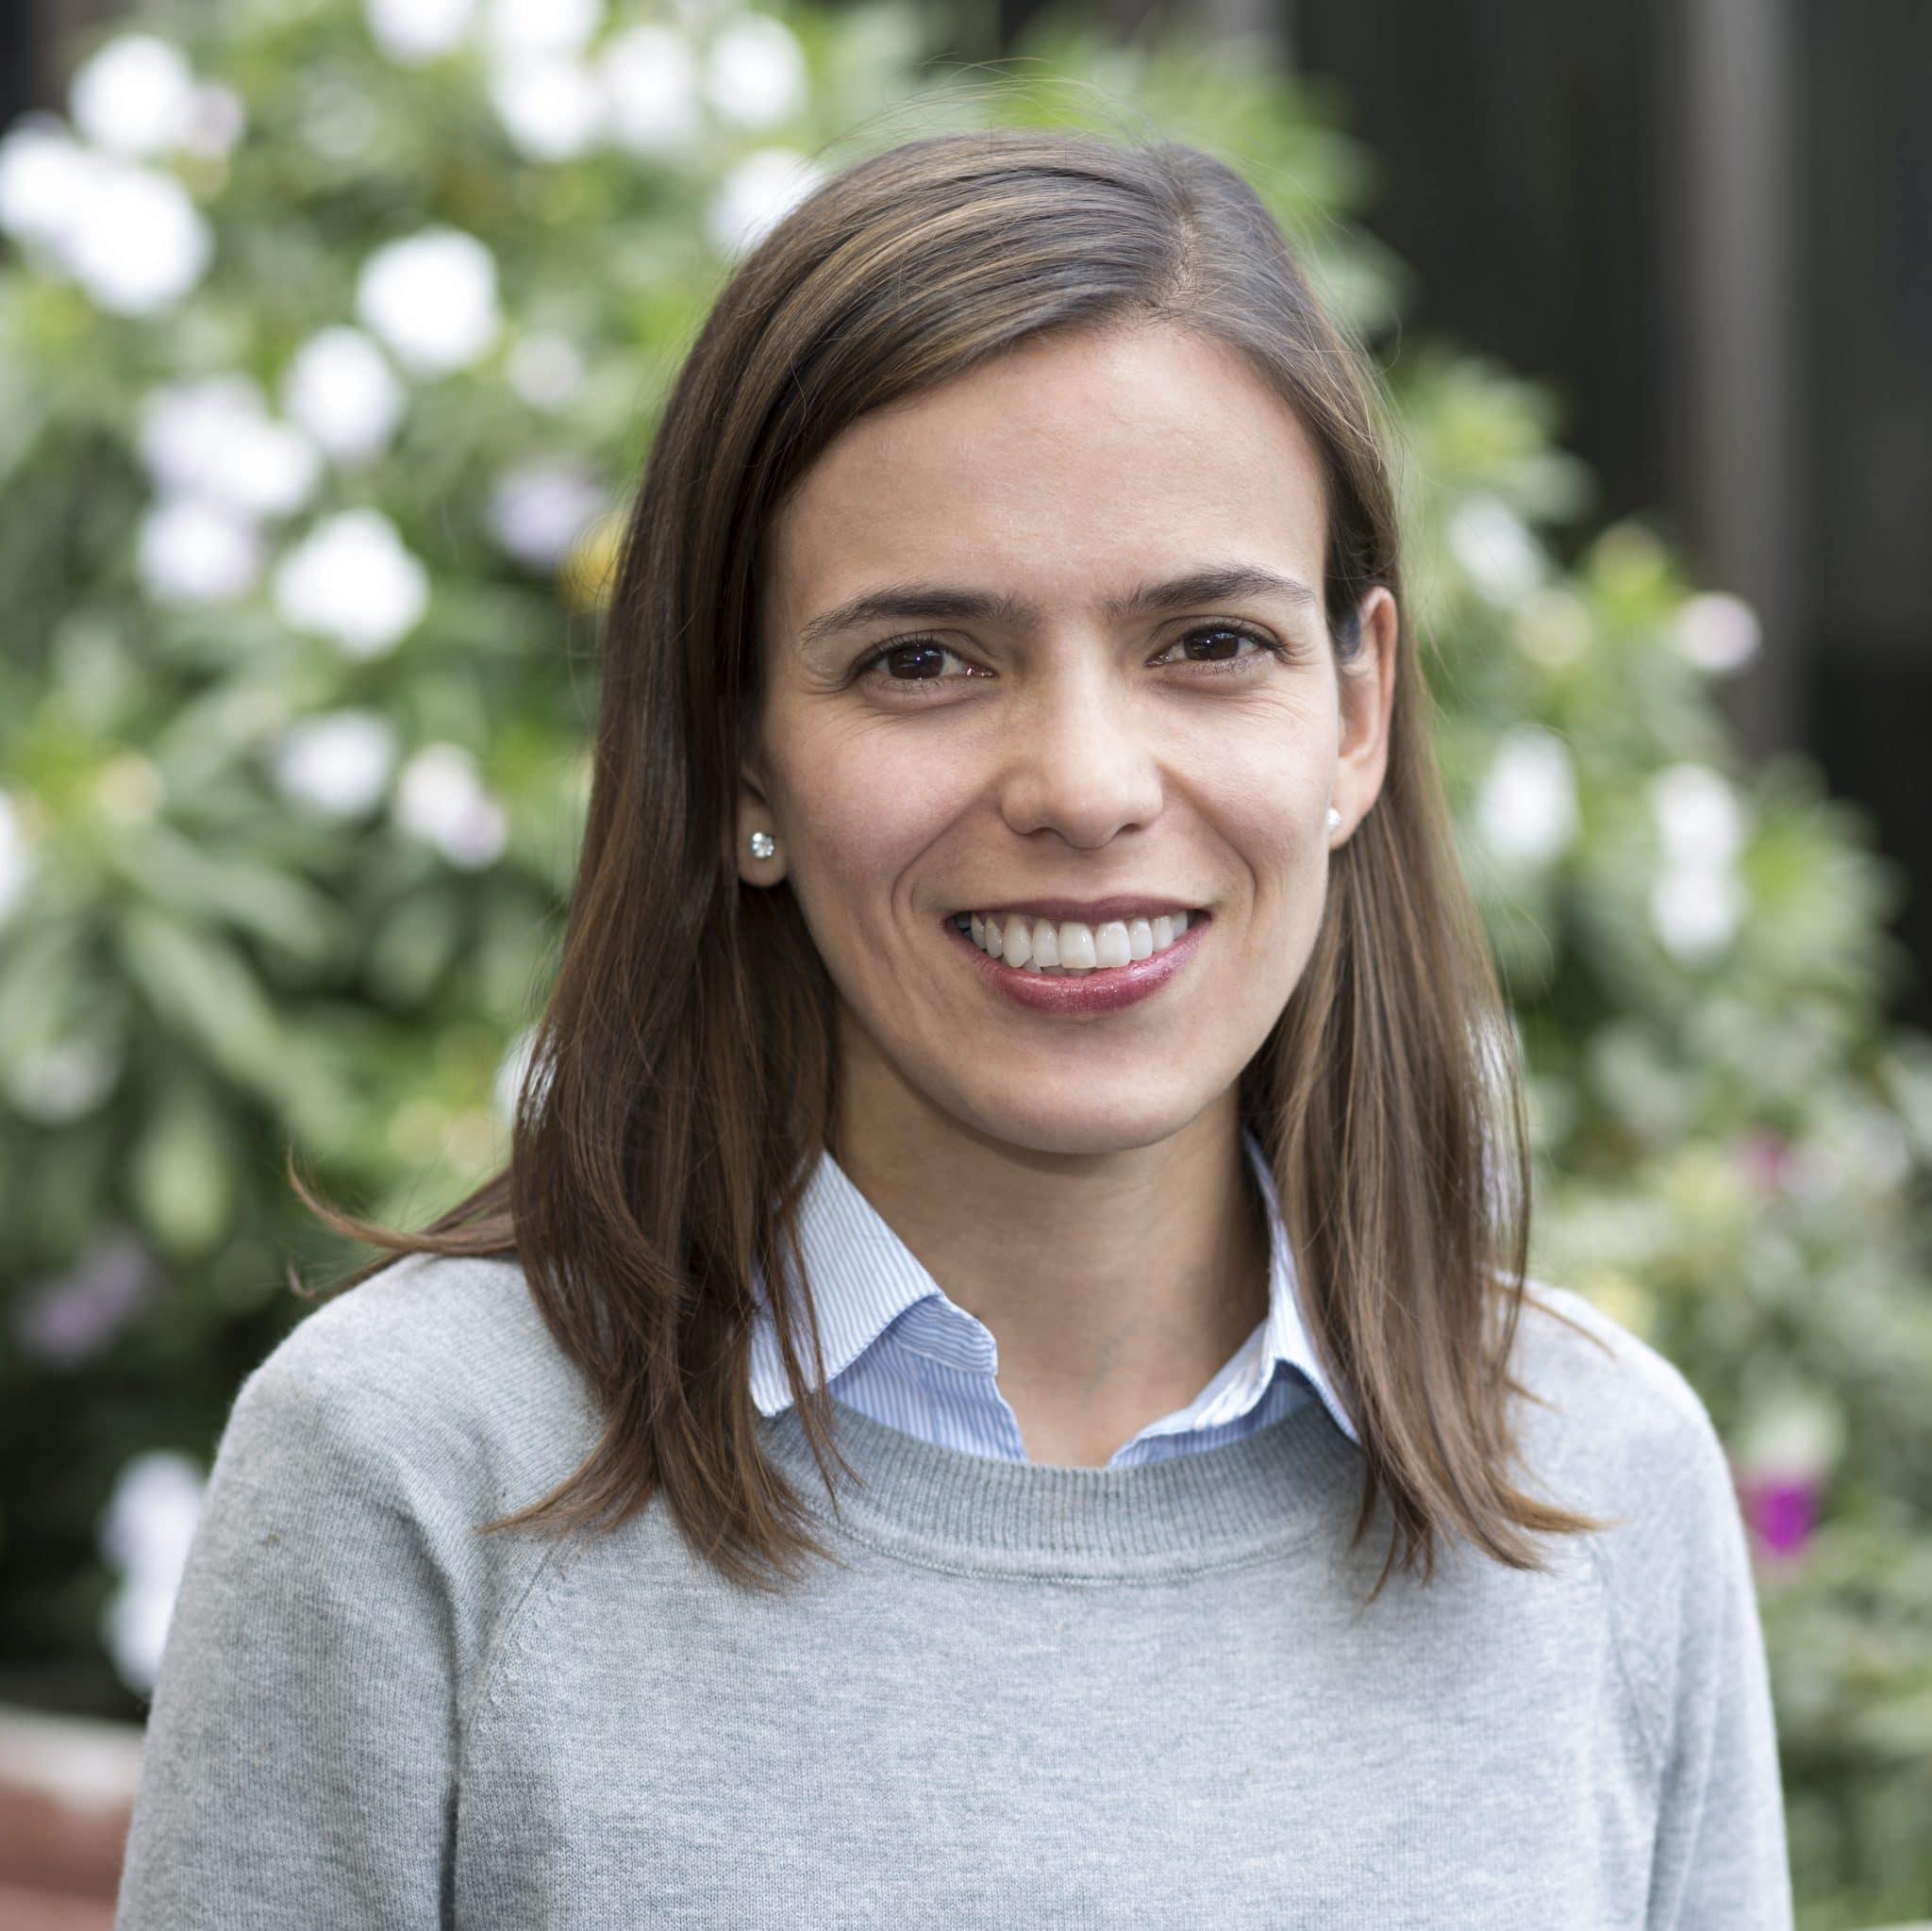 Lia Gonzales